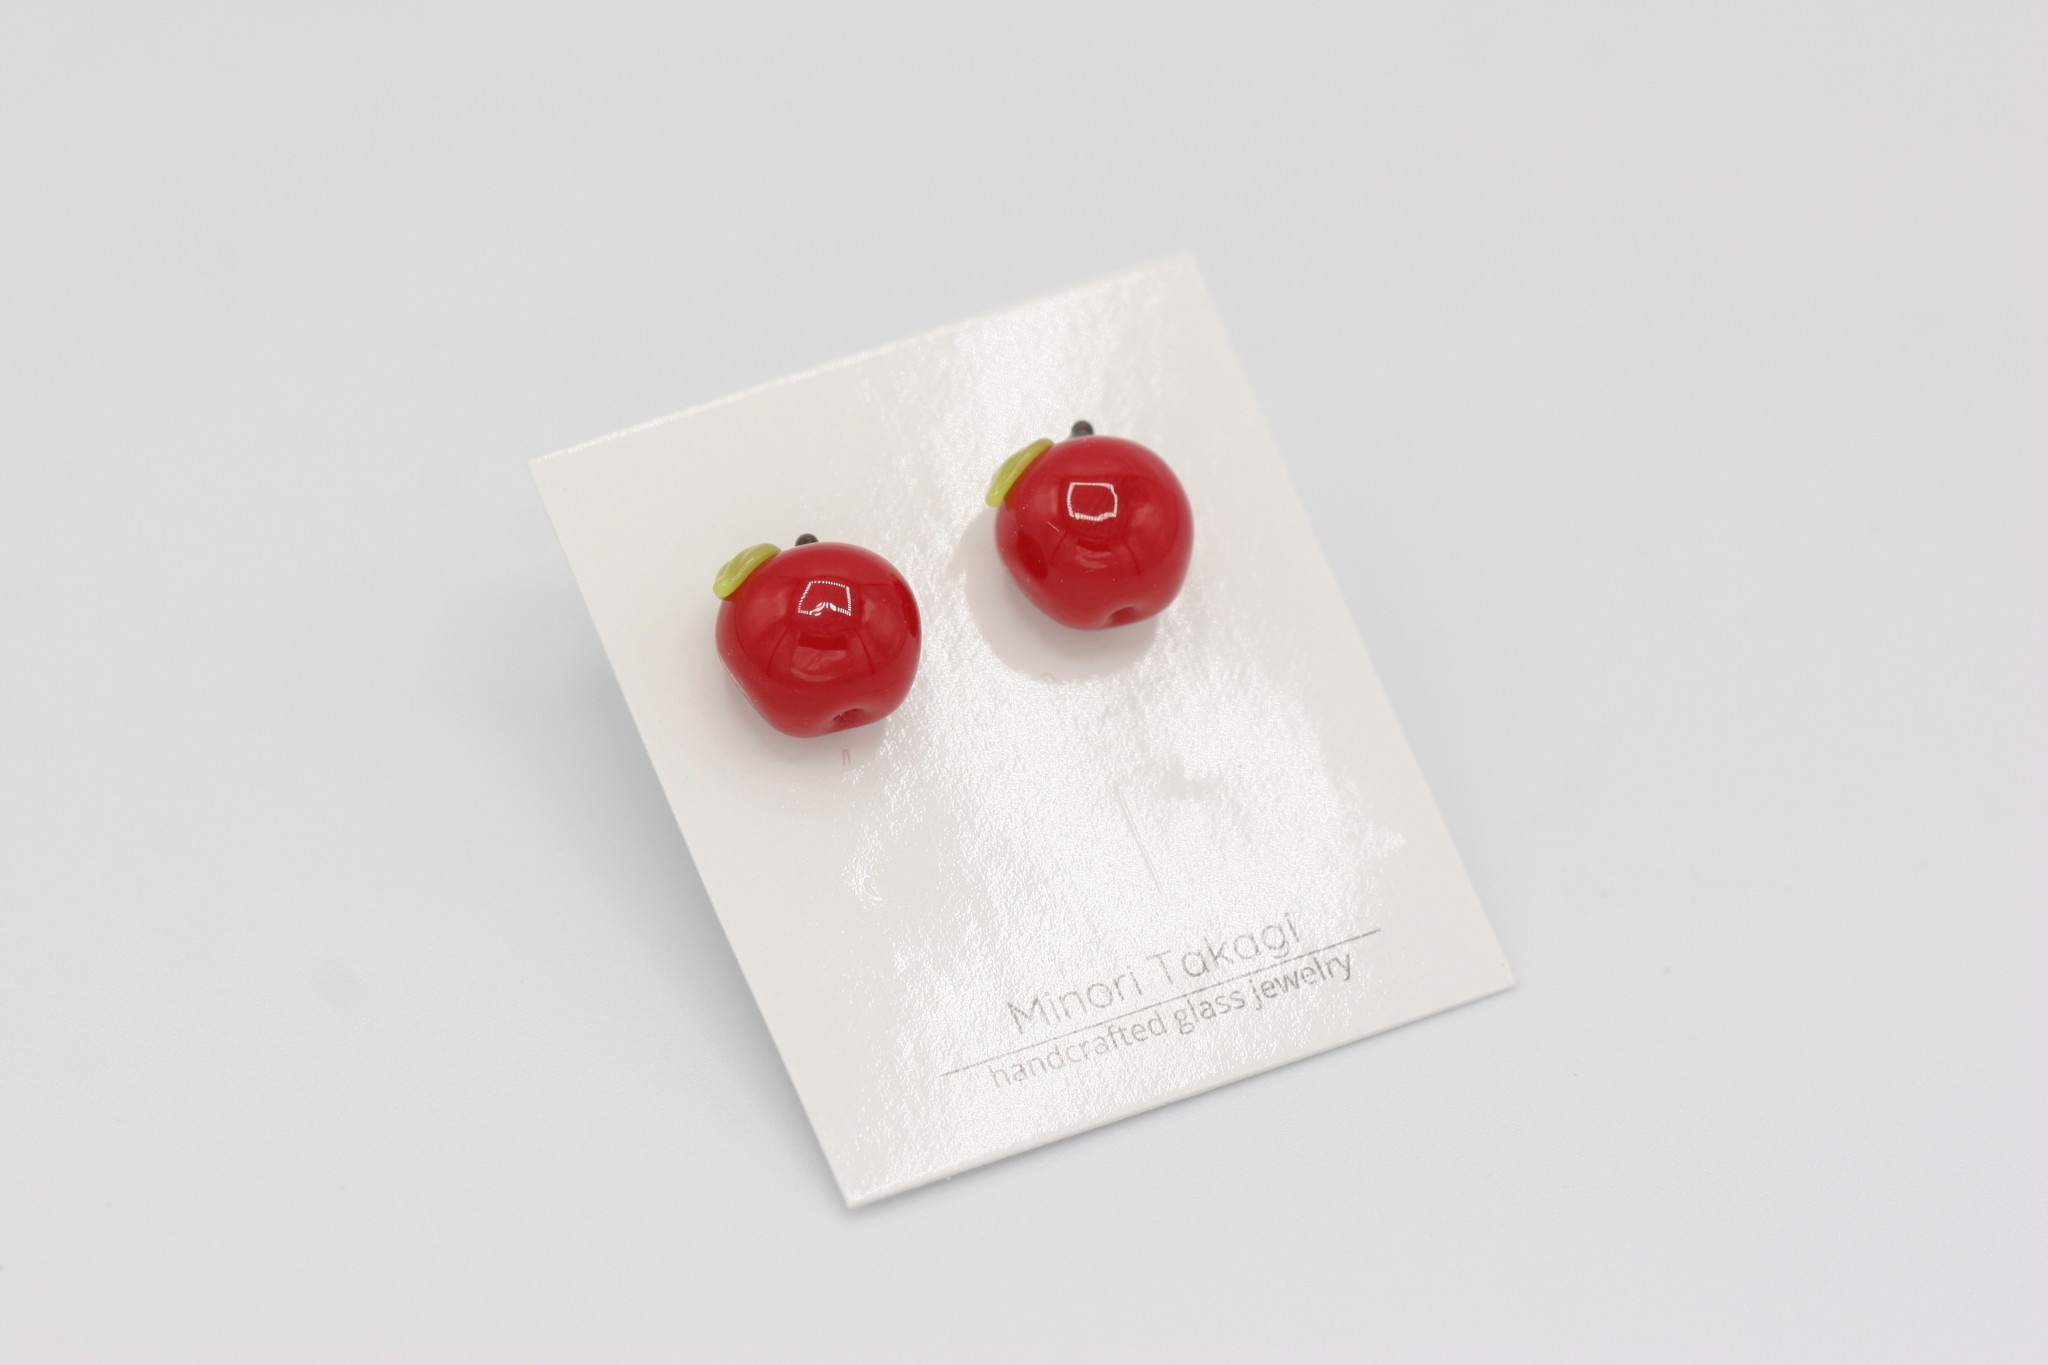 Minori Takagi Earrings - Red Apple